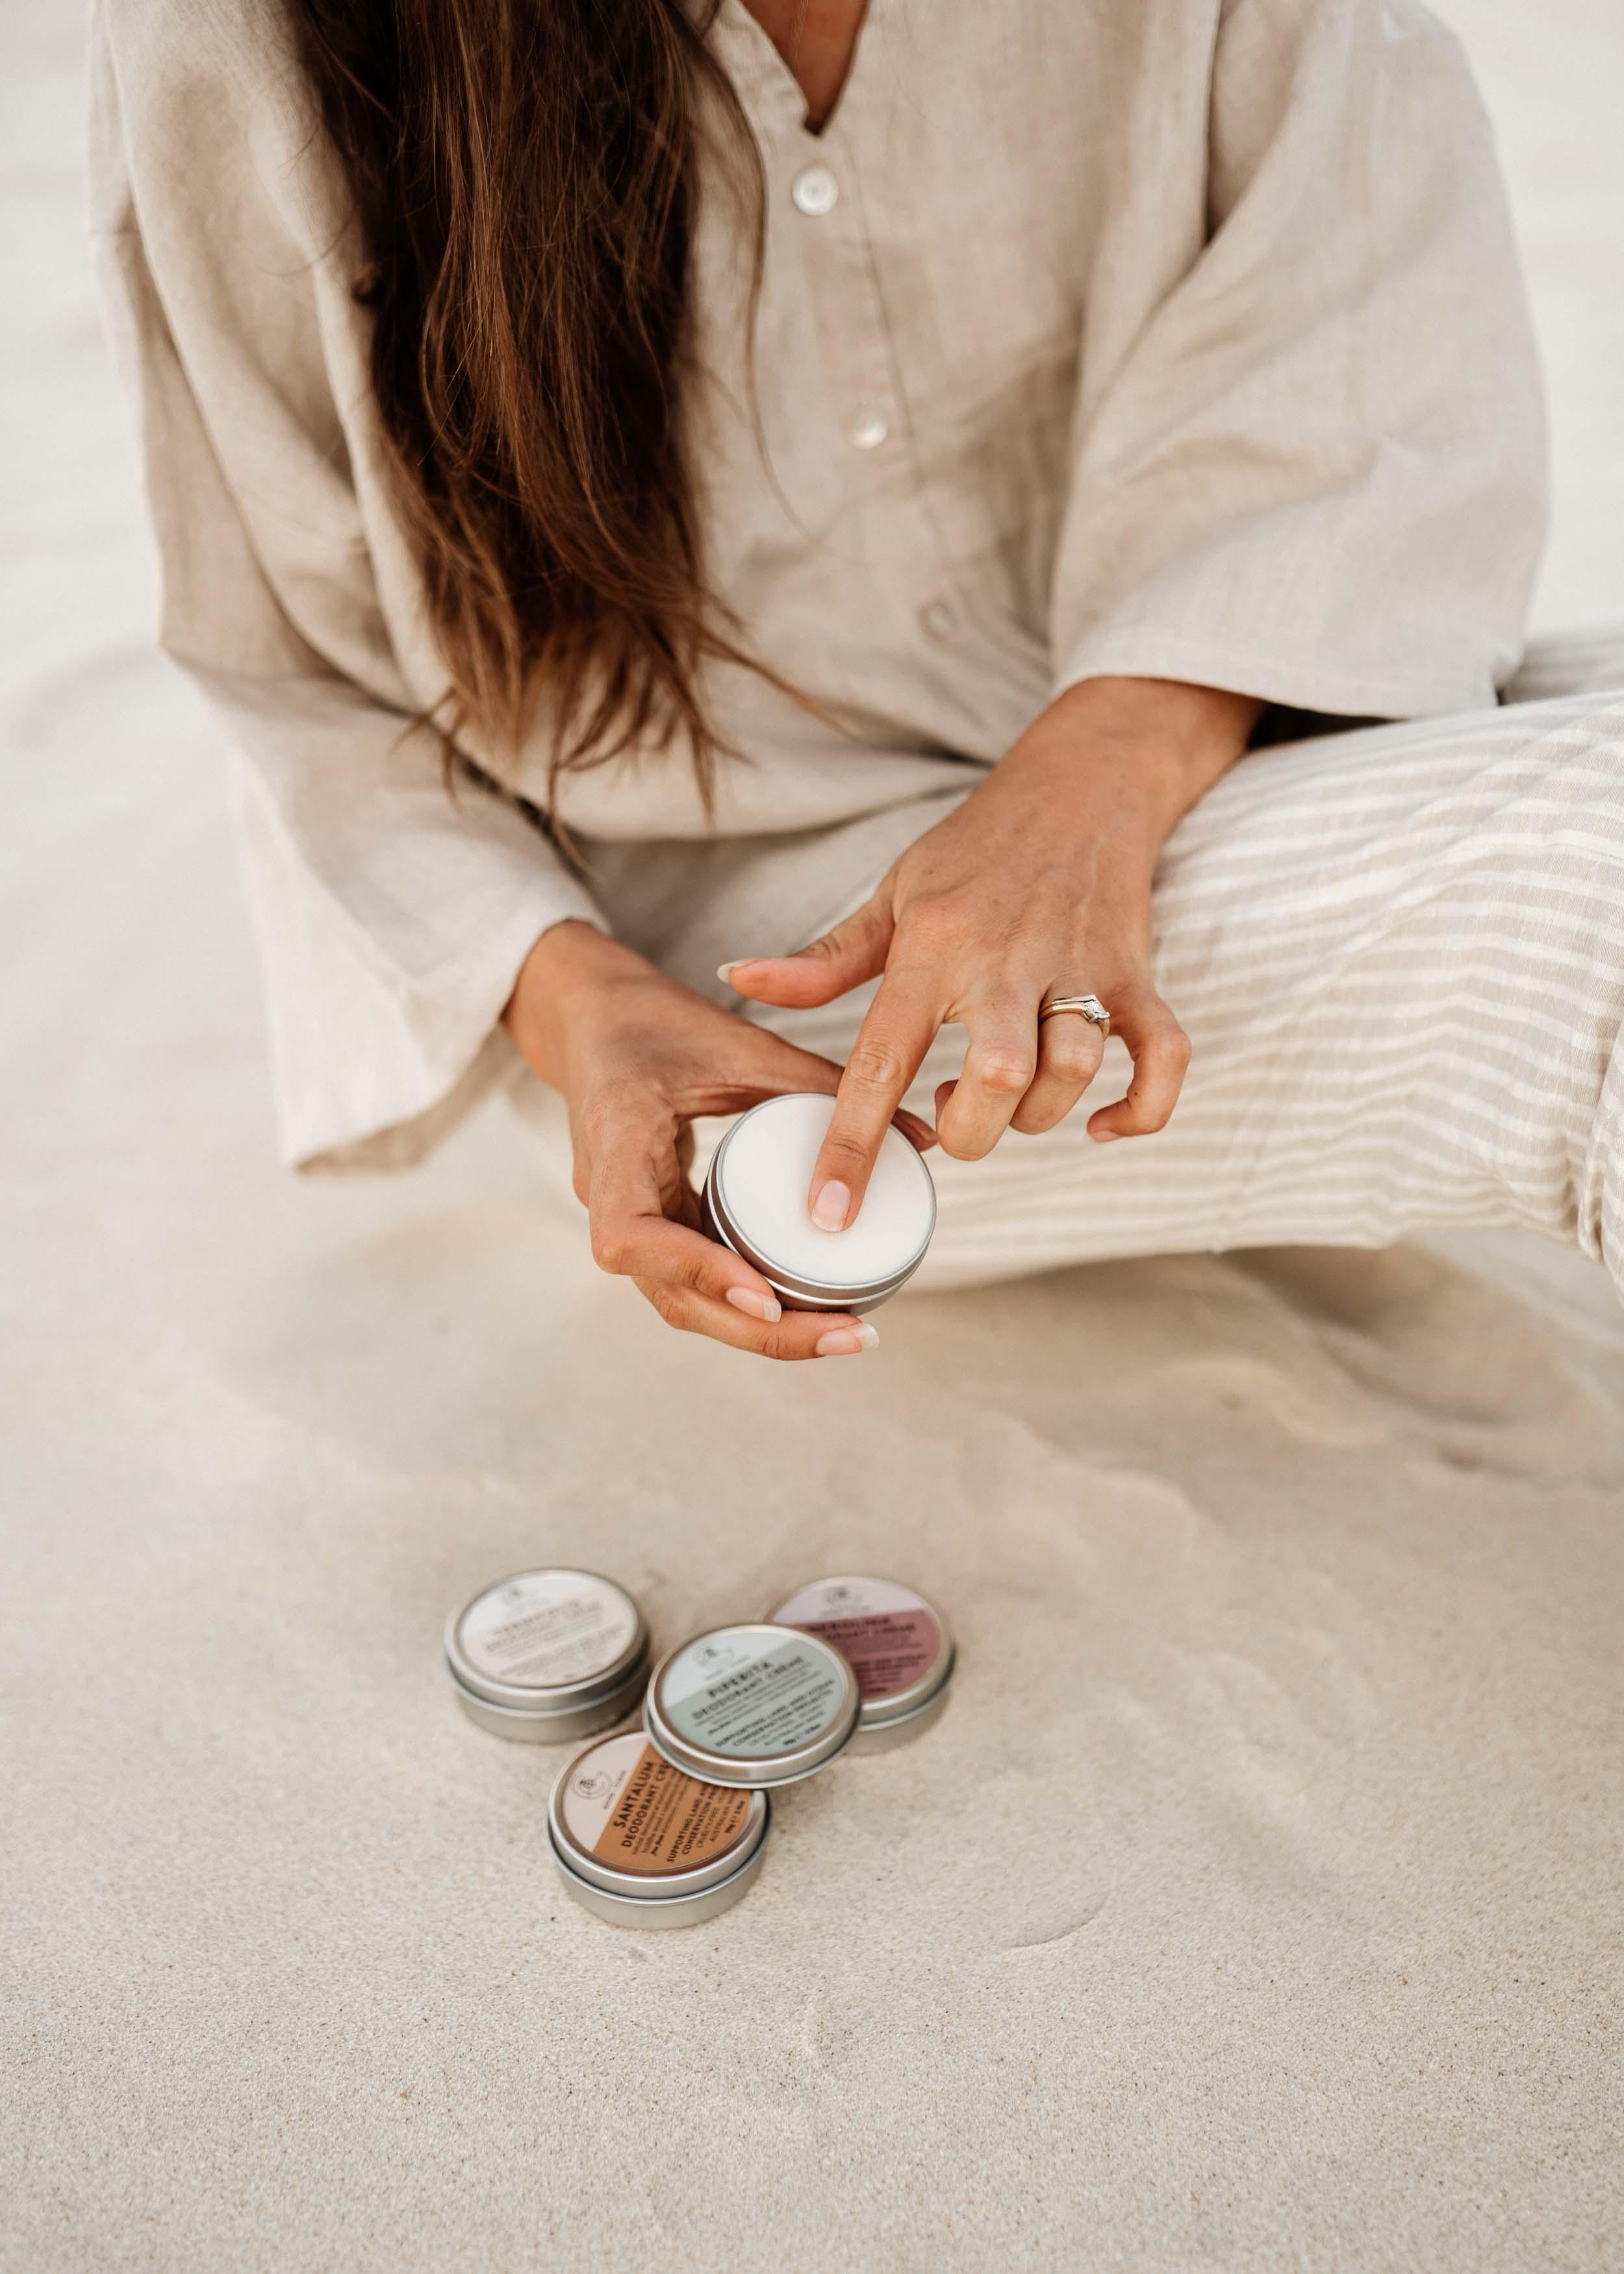 keira-mason-good-and-clean-testing-new-deodorant.jpg